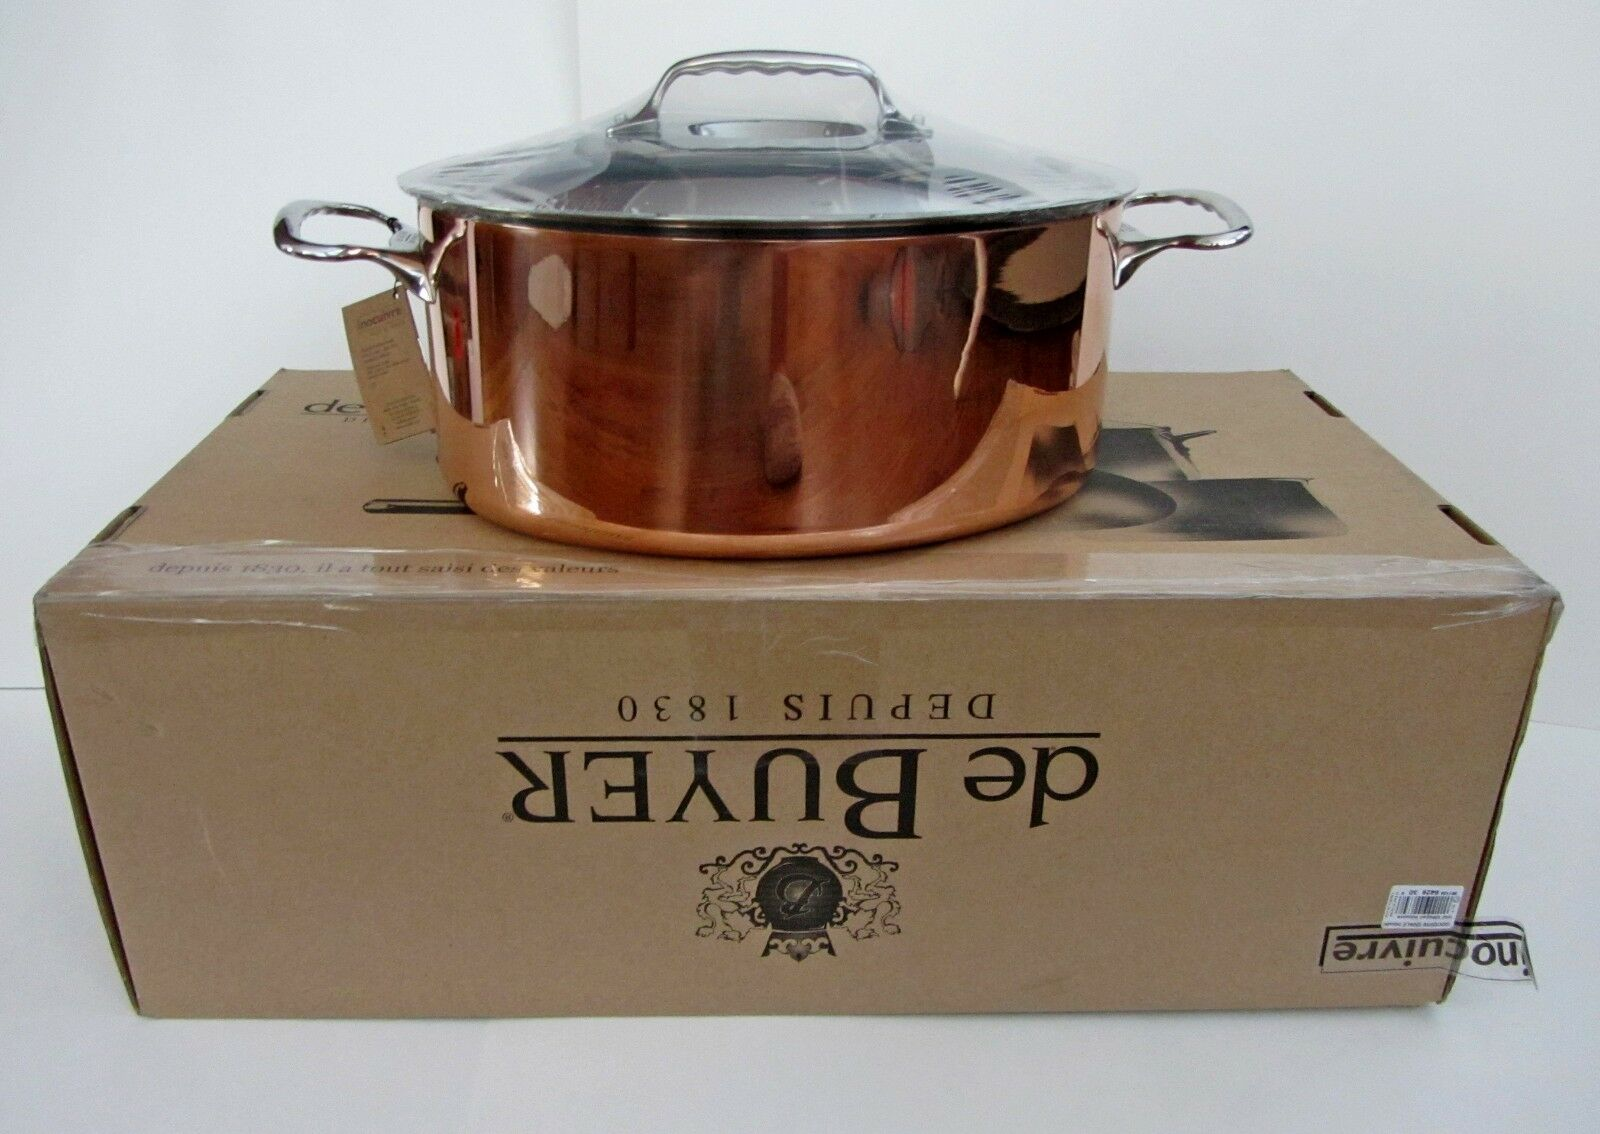 De Buyer INOCUIVRE Oval Stewpan w. Lid Copper Stainless France 6.5 Liters NEW